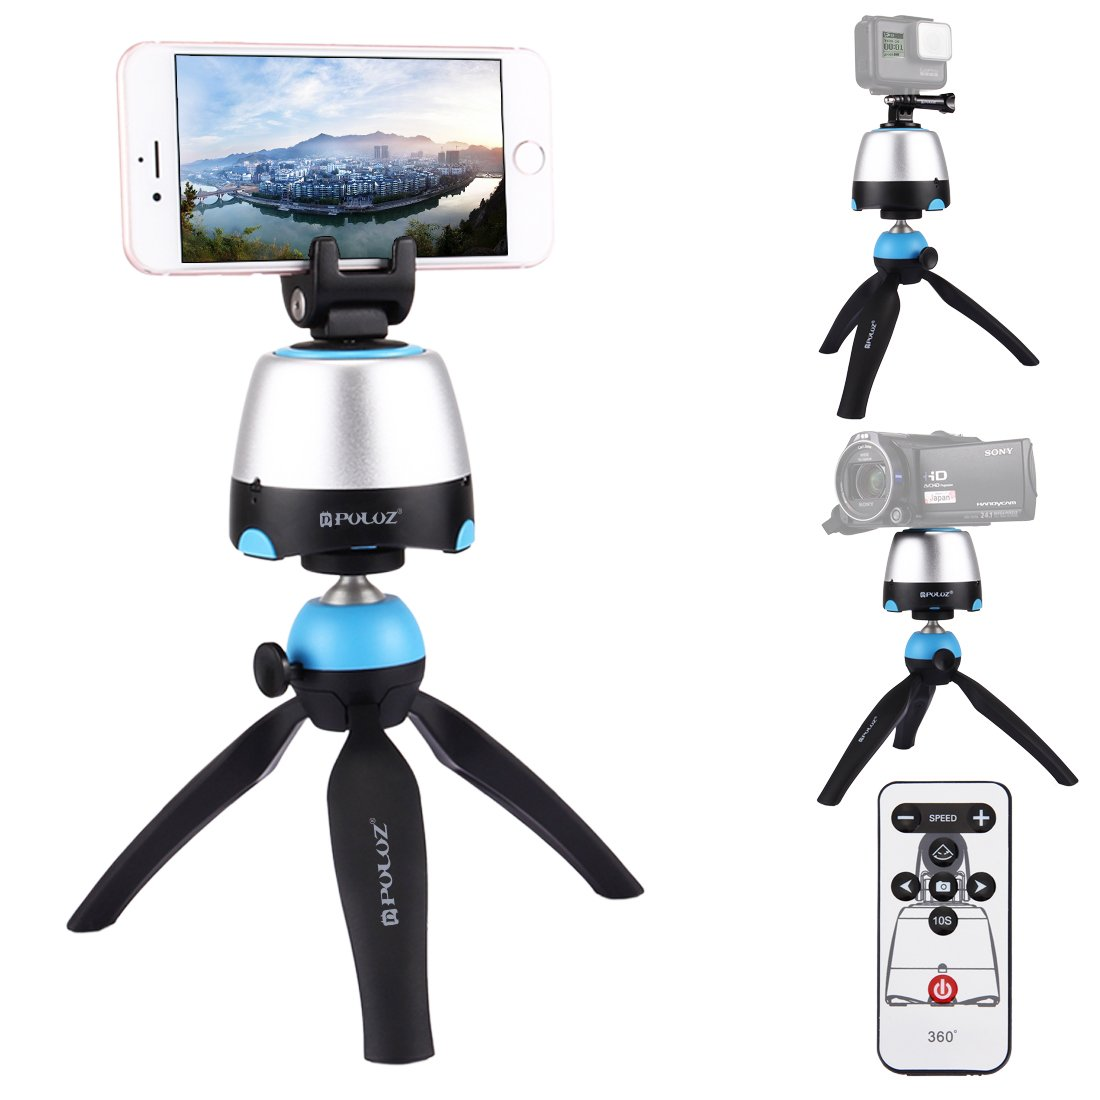 Camera Tripod Kit, PULUZ 360 Degree Rotation Panoramic Selfie Stick Bluetooth Self-timer with Tripod Head + Tripod Stand + Action Camera Mount + Phone Clamp + Remote Control (Tripod Kit Blue)